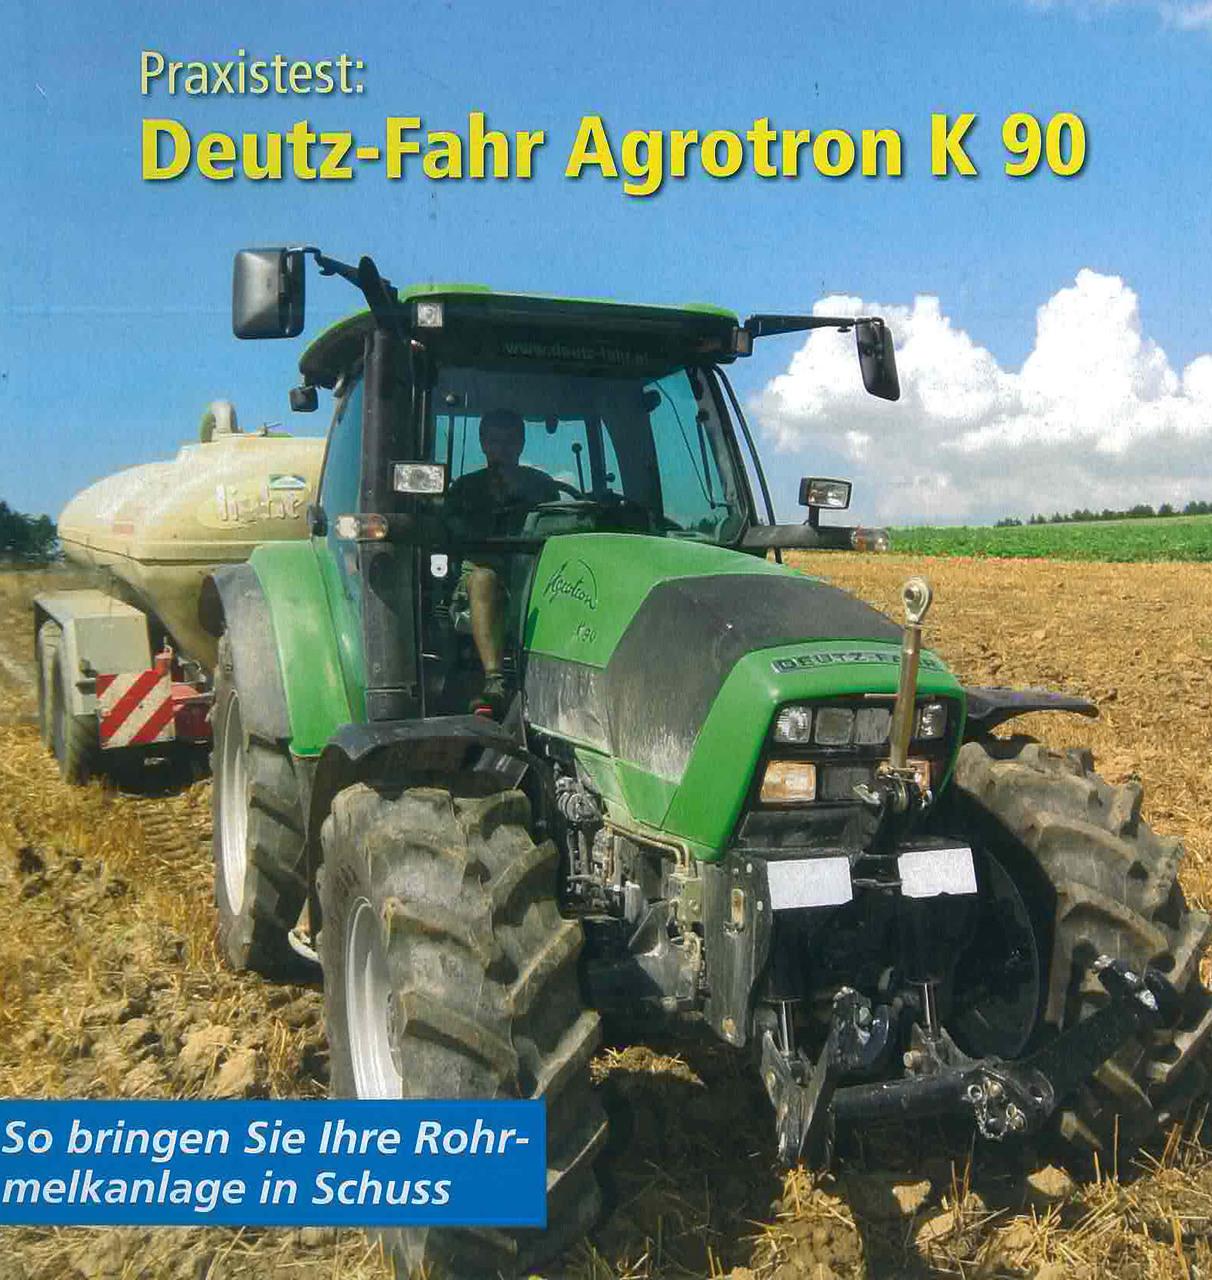 Praxitest: Deutz- Fahr AGROTRON K 90